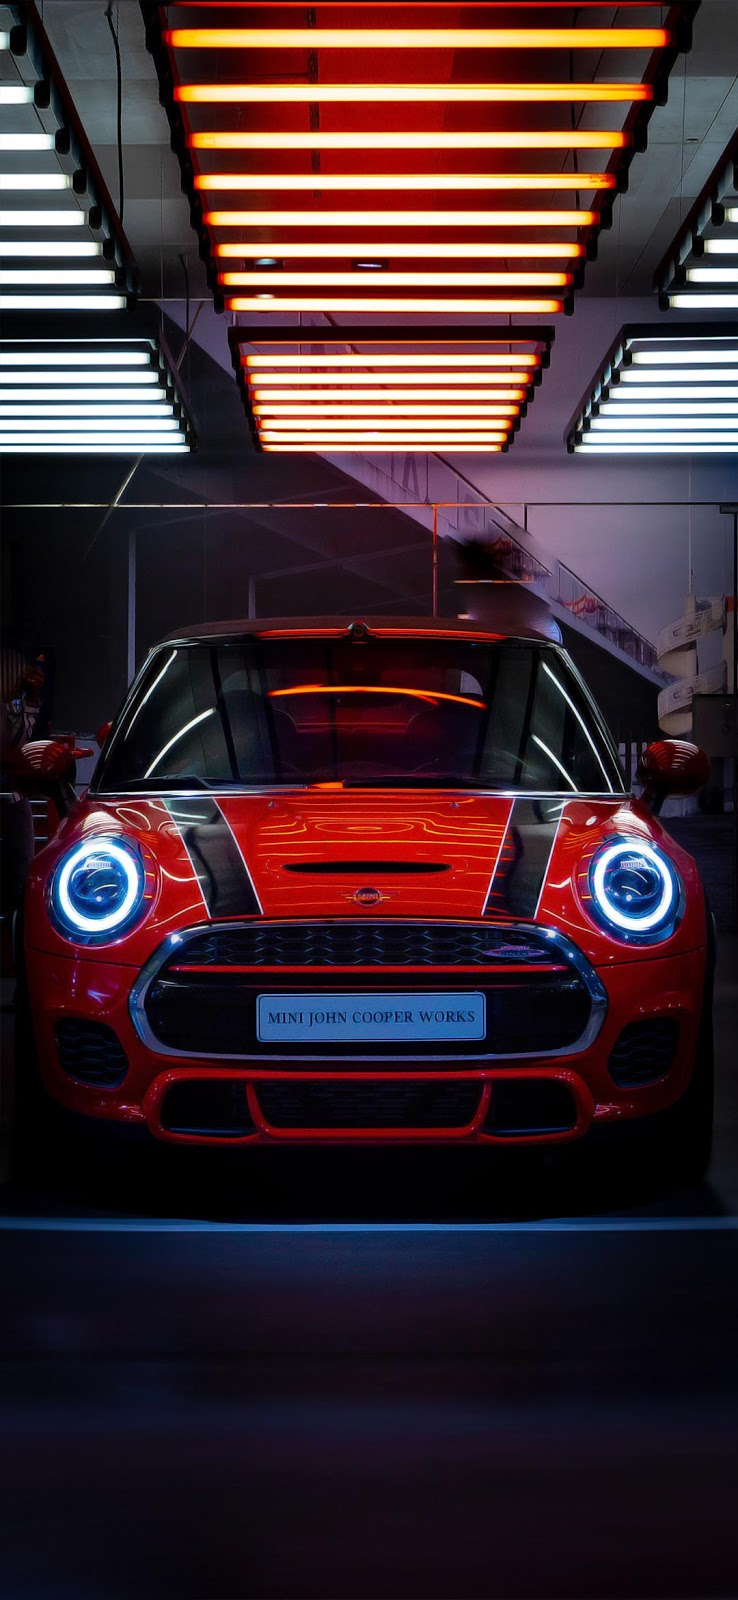 red mini cooper car in dark room wallpaper